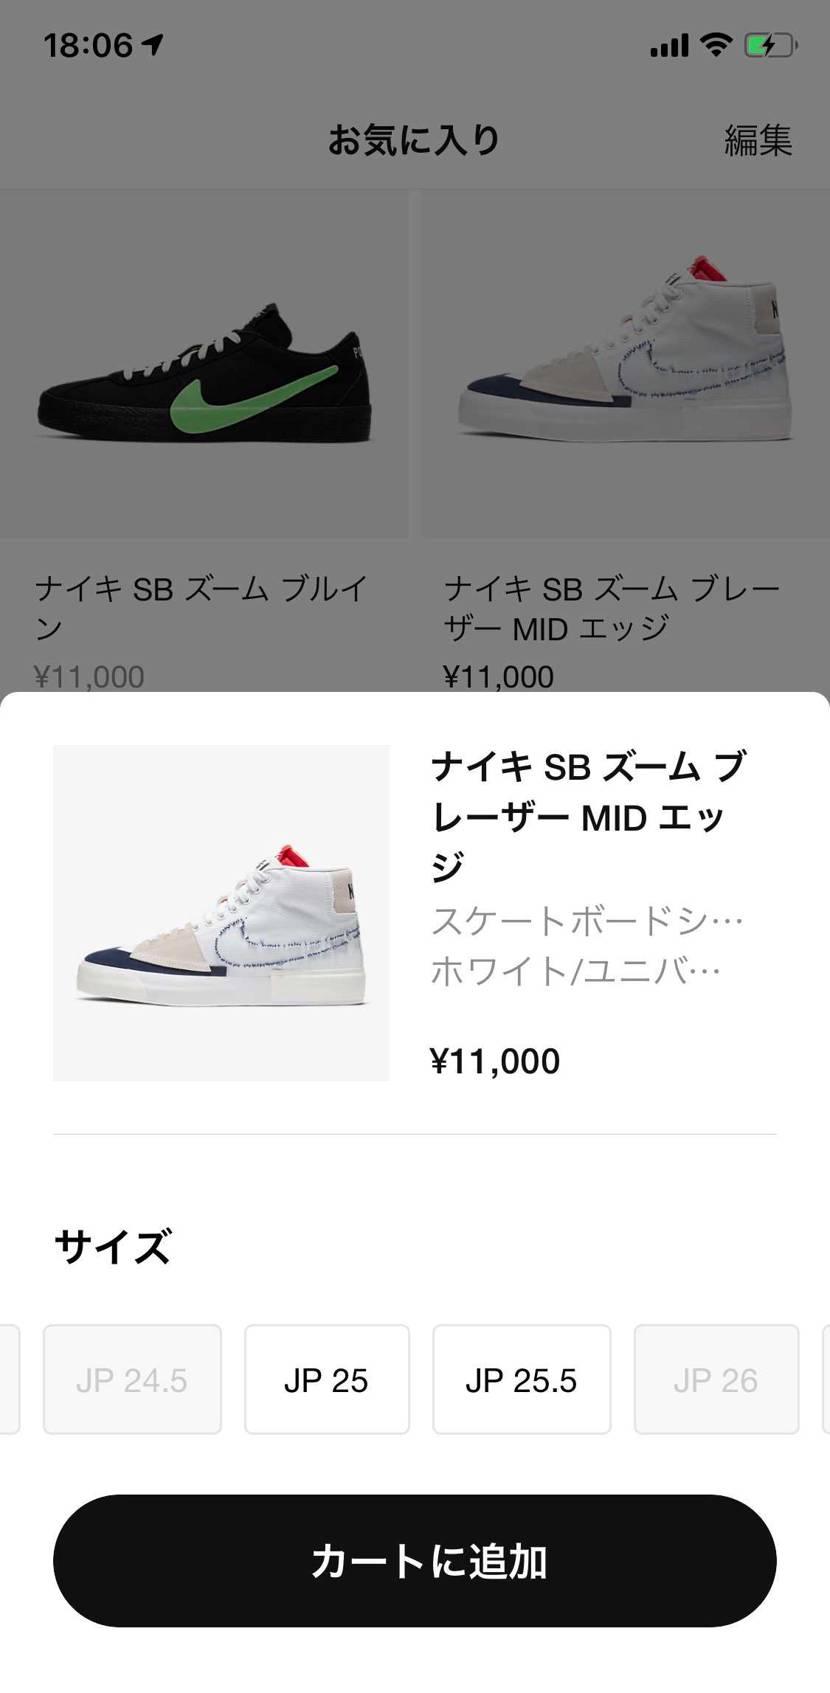 Nike.com 🐿っまーす💦